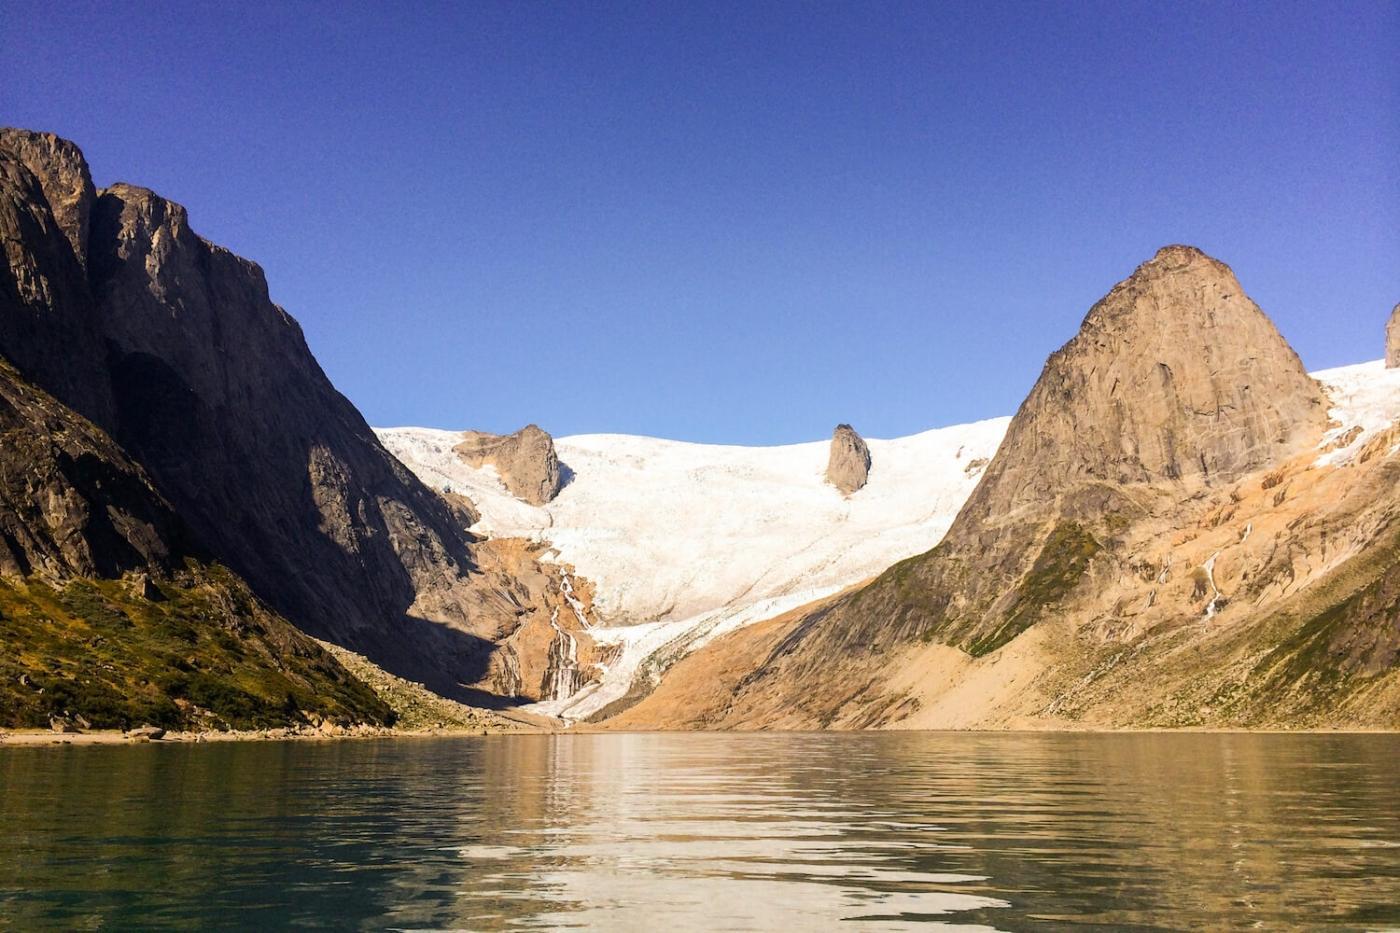 Tasermiut Fjord in South Greenland. Visit Greenland